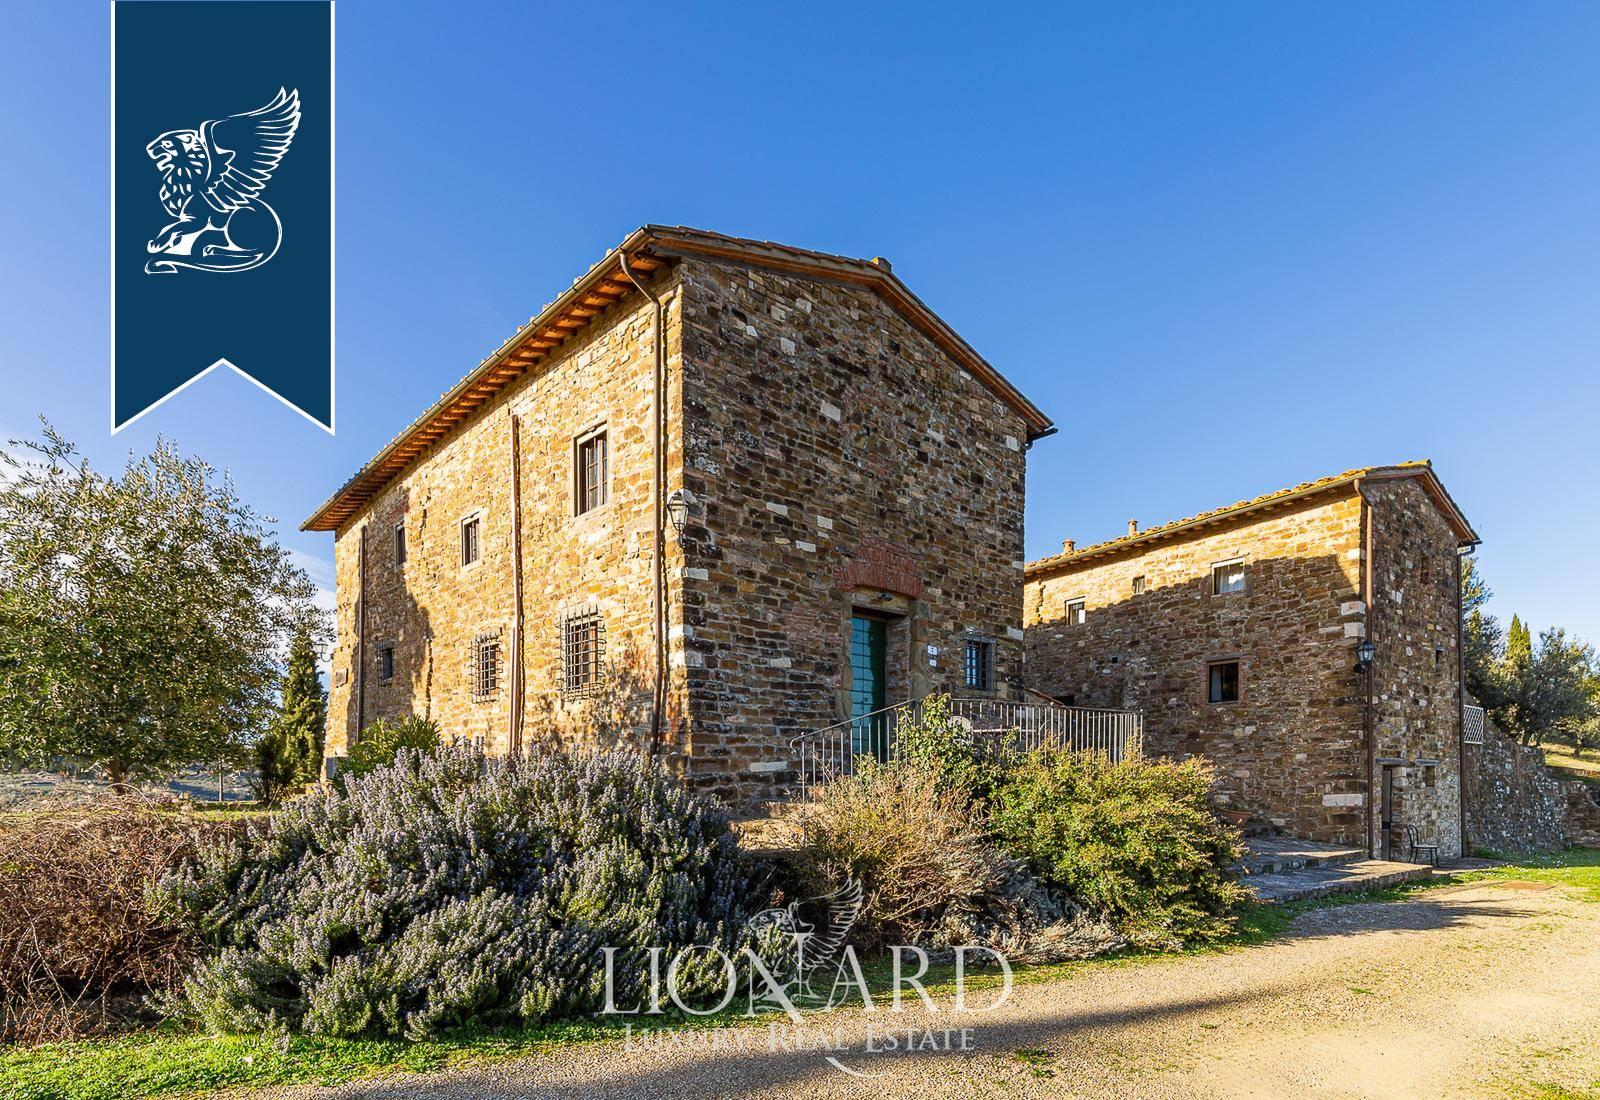 Villa in Vendita a Greve In Chianti: 0 locali, 400 mq - Foto 2